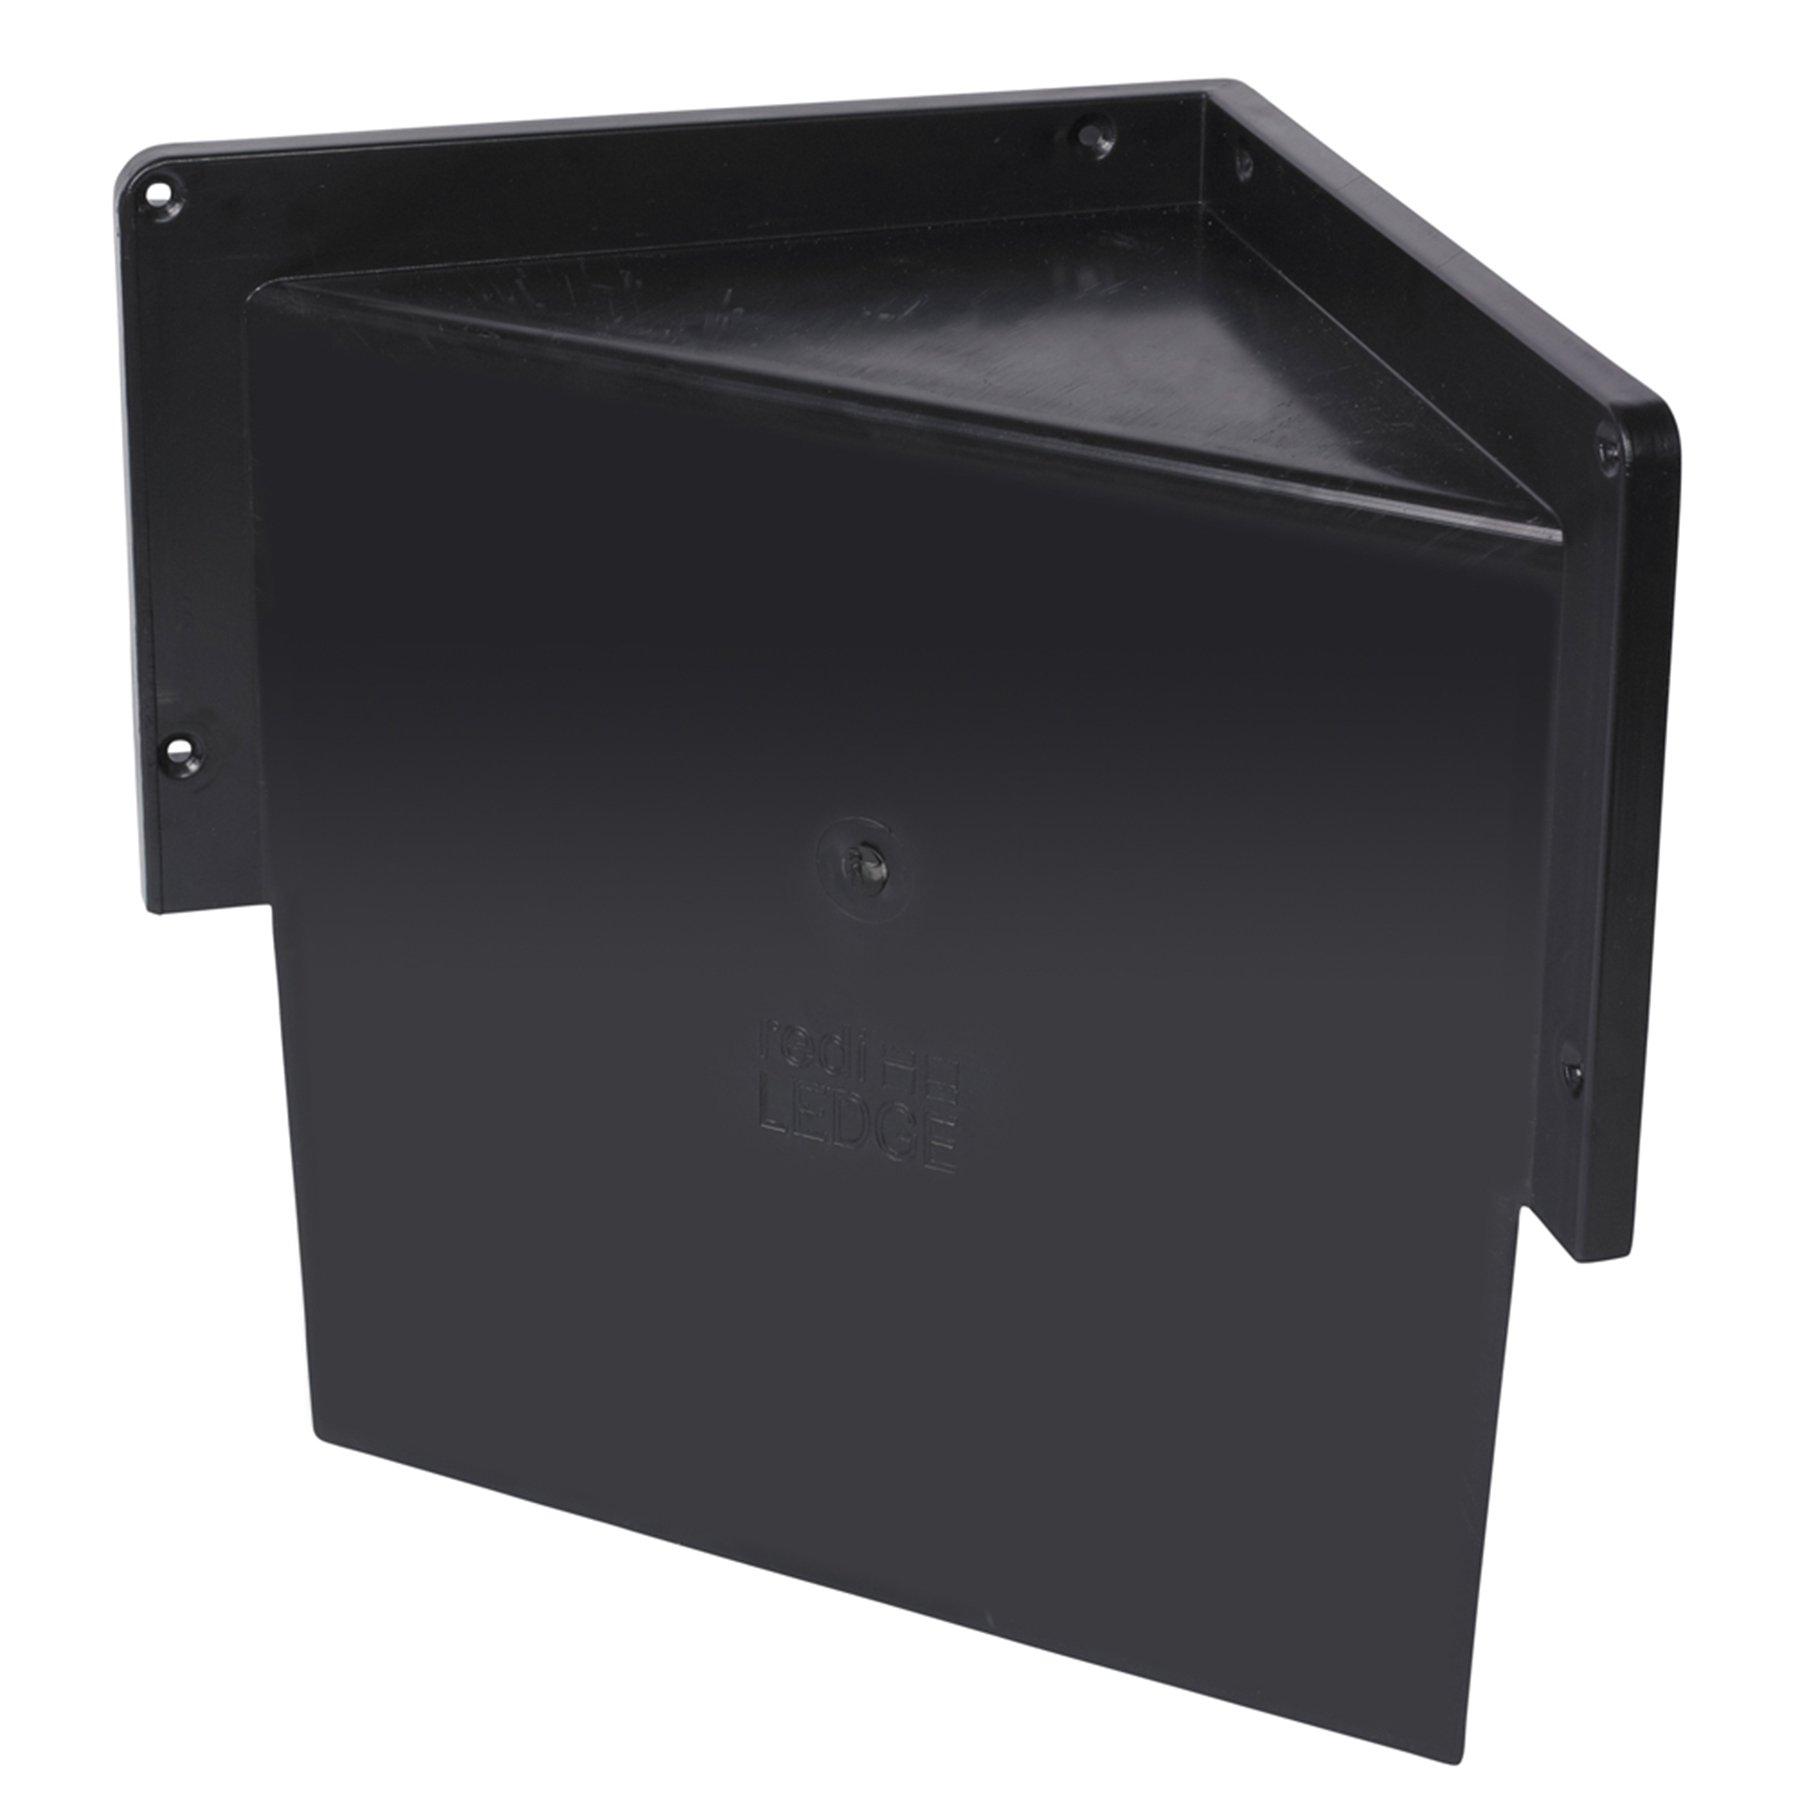 Tile Redi USA RLCorner Redi Ledge Shower Ledge, 15.56'' W x 8.06'' D x 12'' H, Black